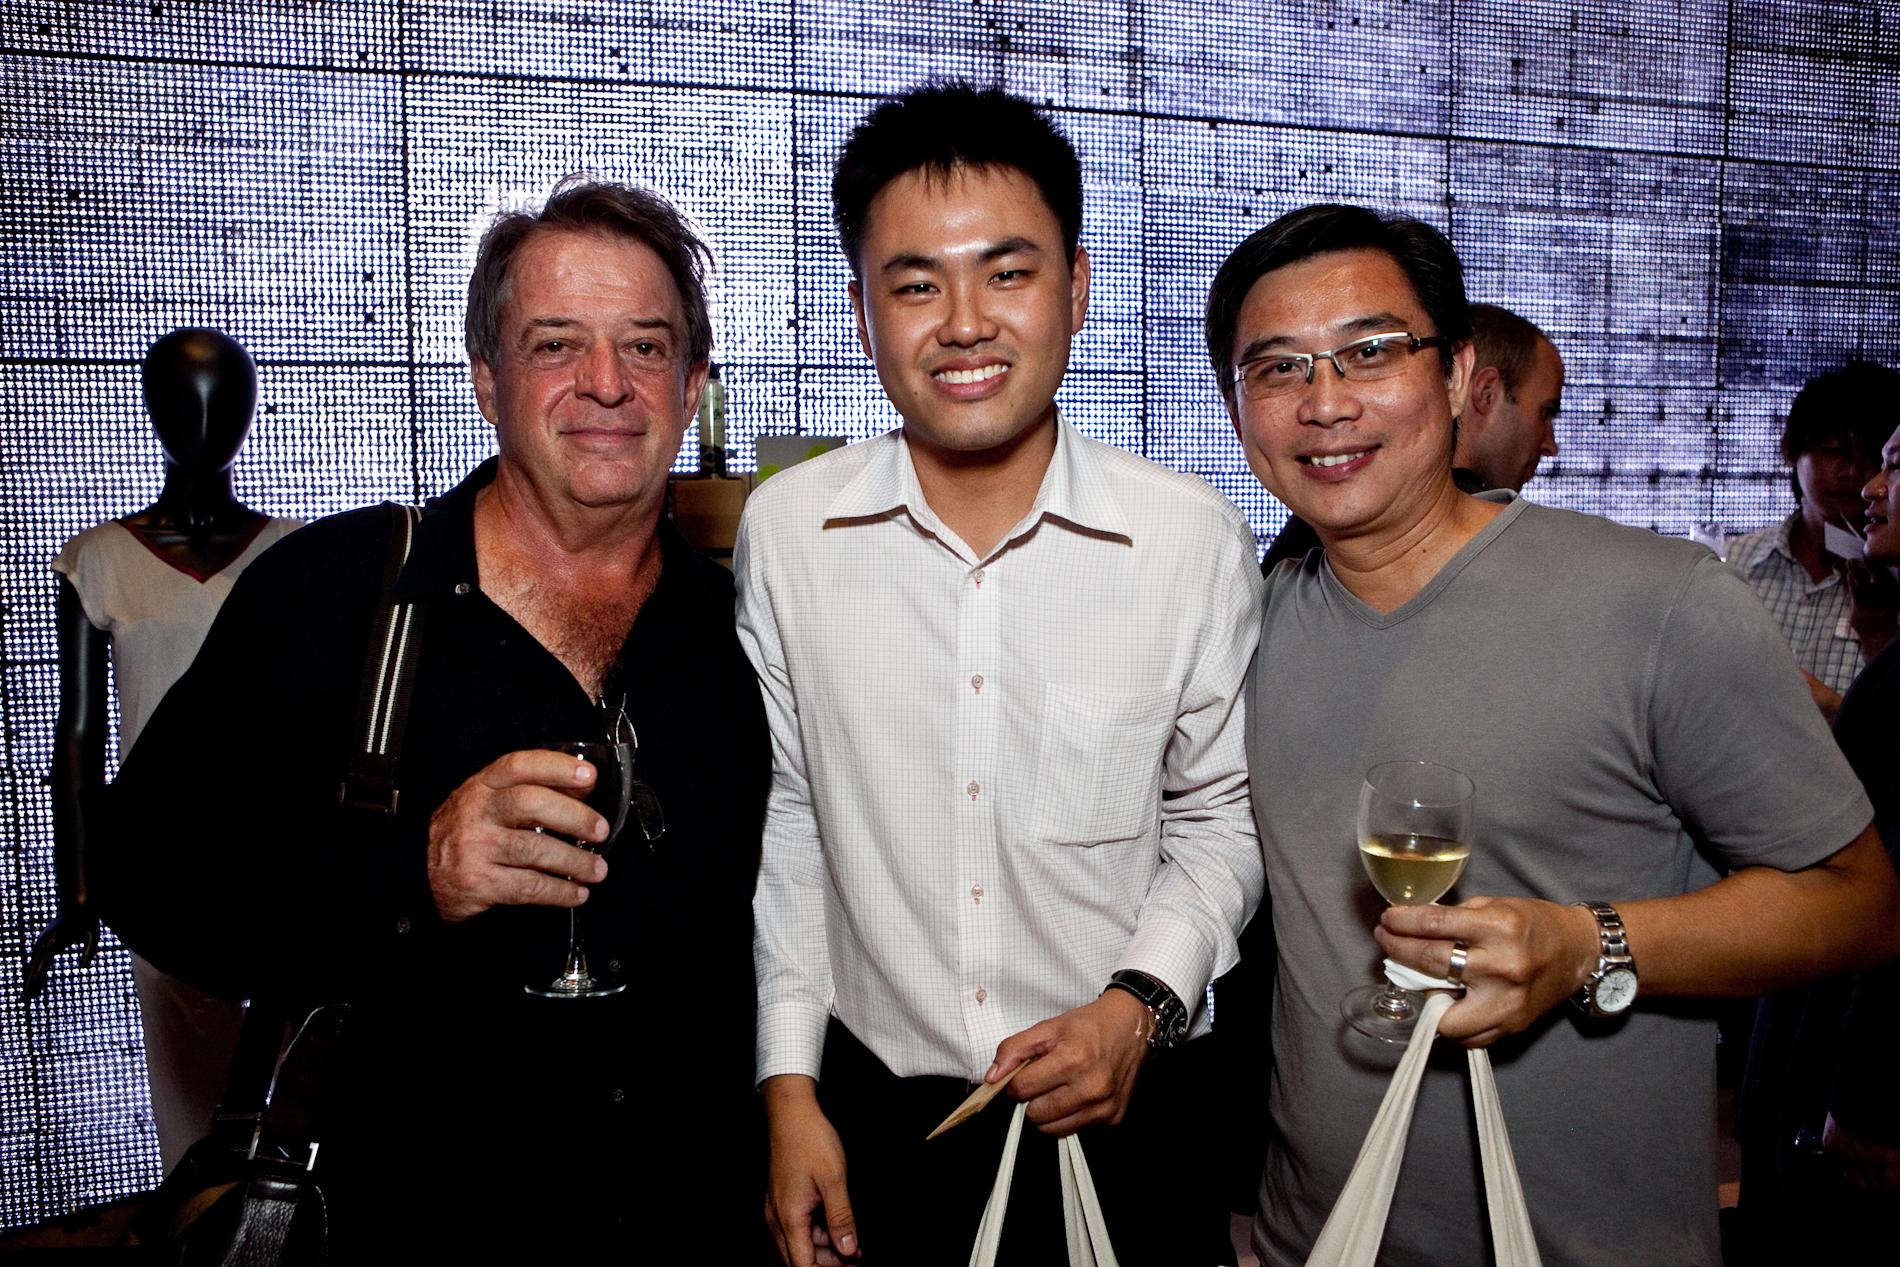 qi-global-2009-sustaible-design-singapore-138.jpg